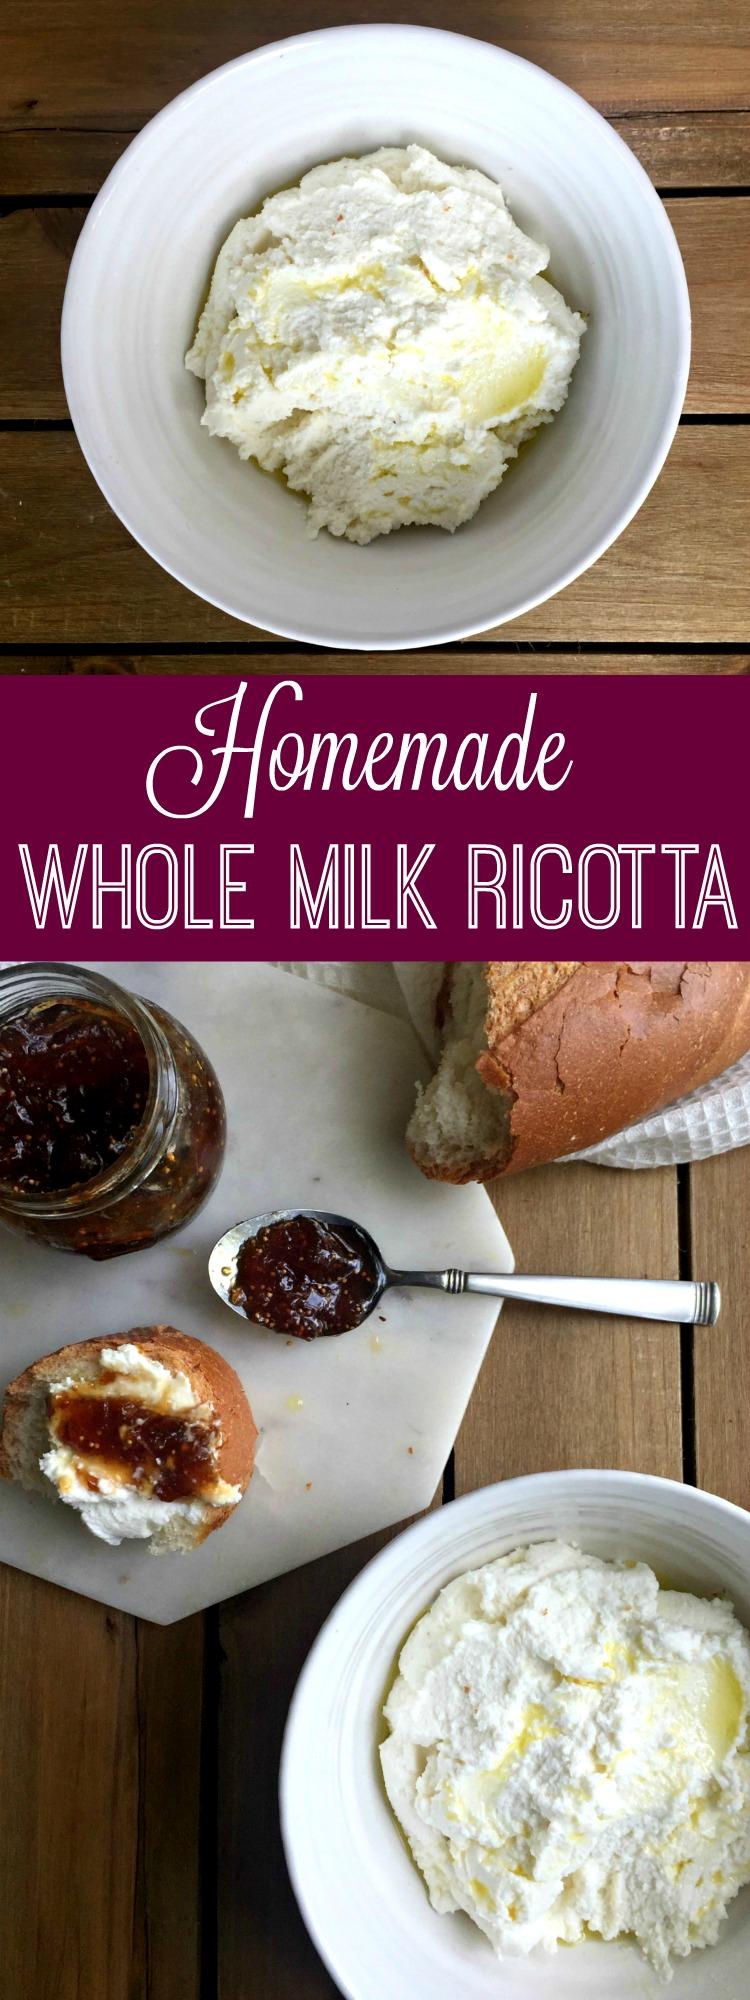 Homemade Whole Milk Ricotta Cheese